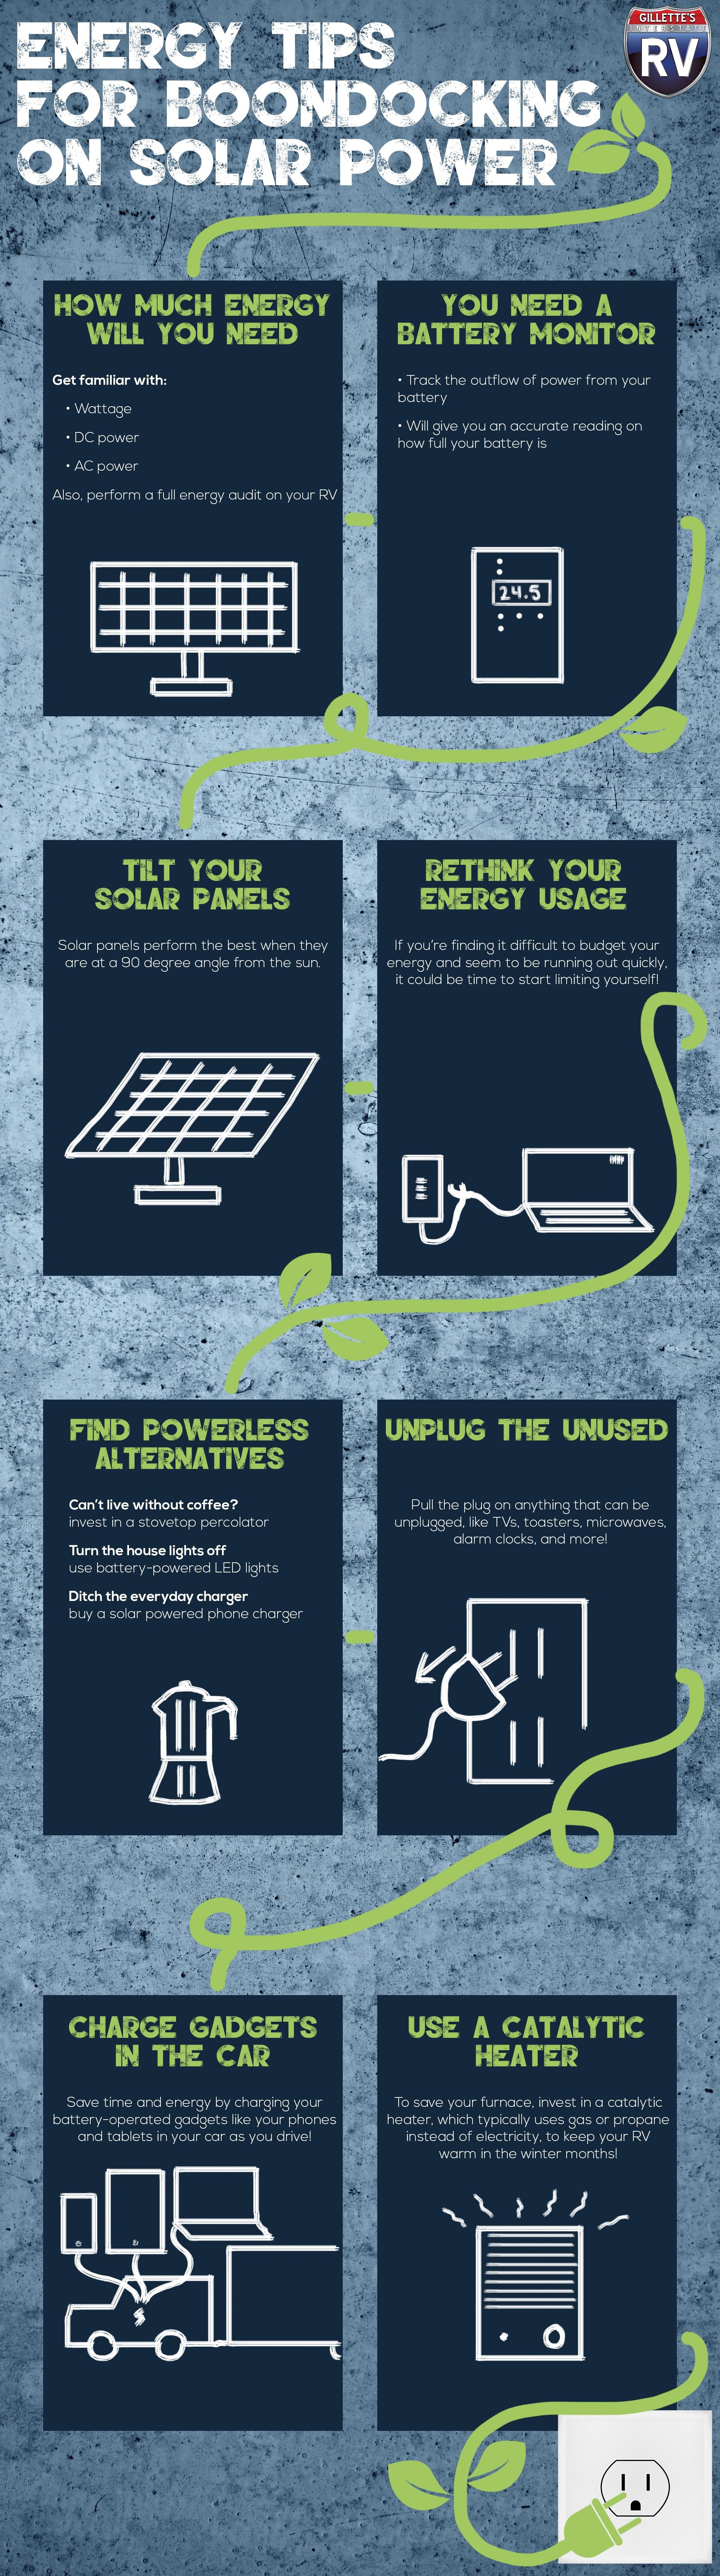 energy saving for boondocking